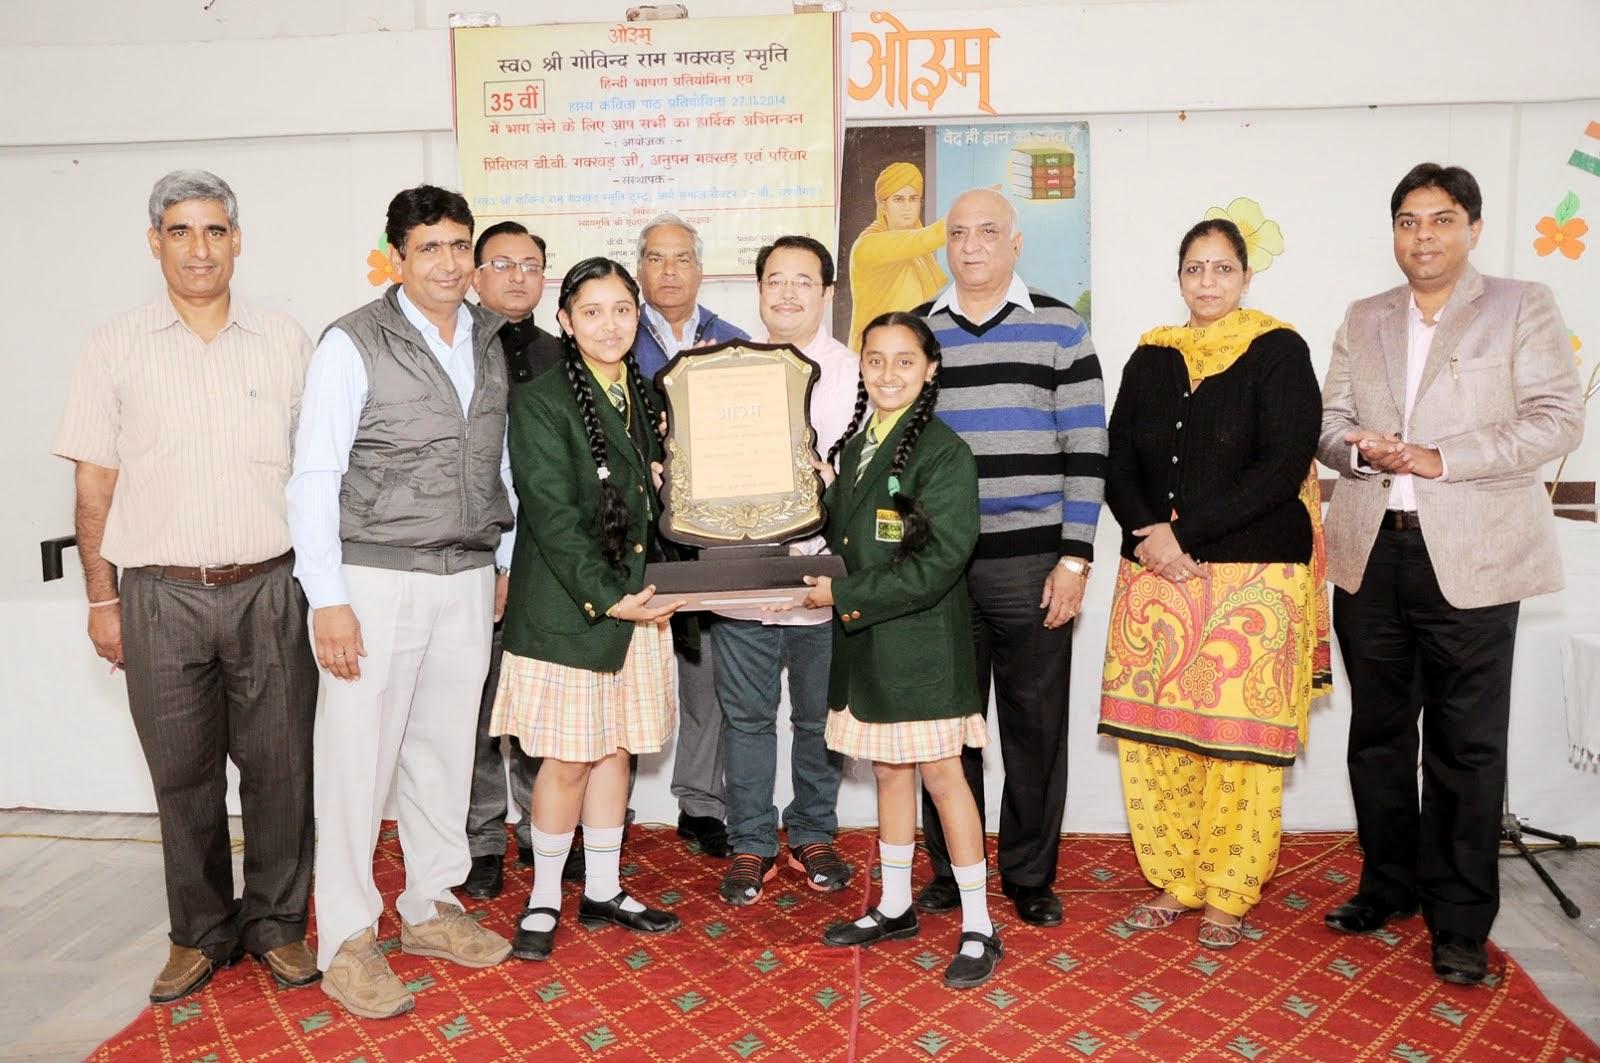 hindi declamation Hindi declamation competition 1st position- neha ( 2016 batch) 2nd position- shweta charag (2016 batch) 3rd position- prashant kumar (2016 batch.